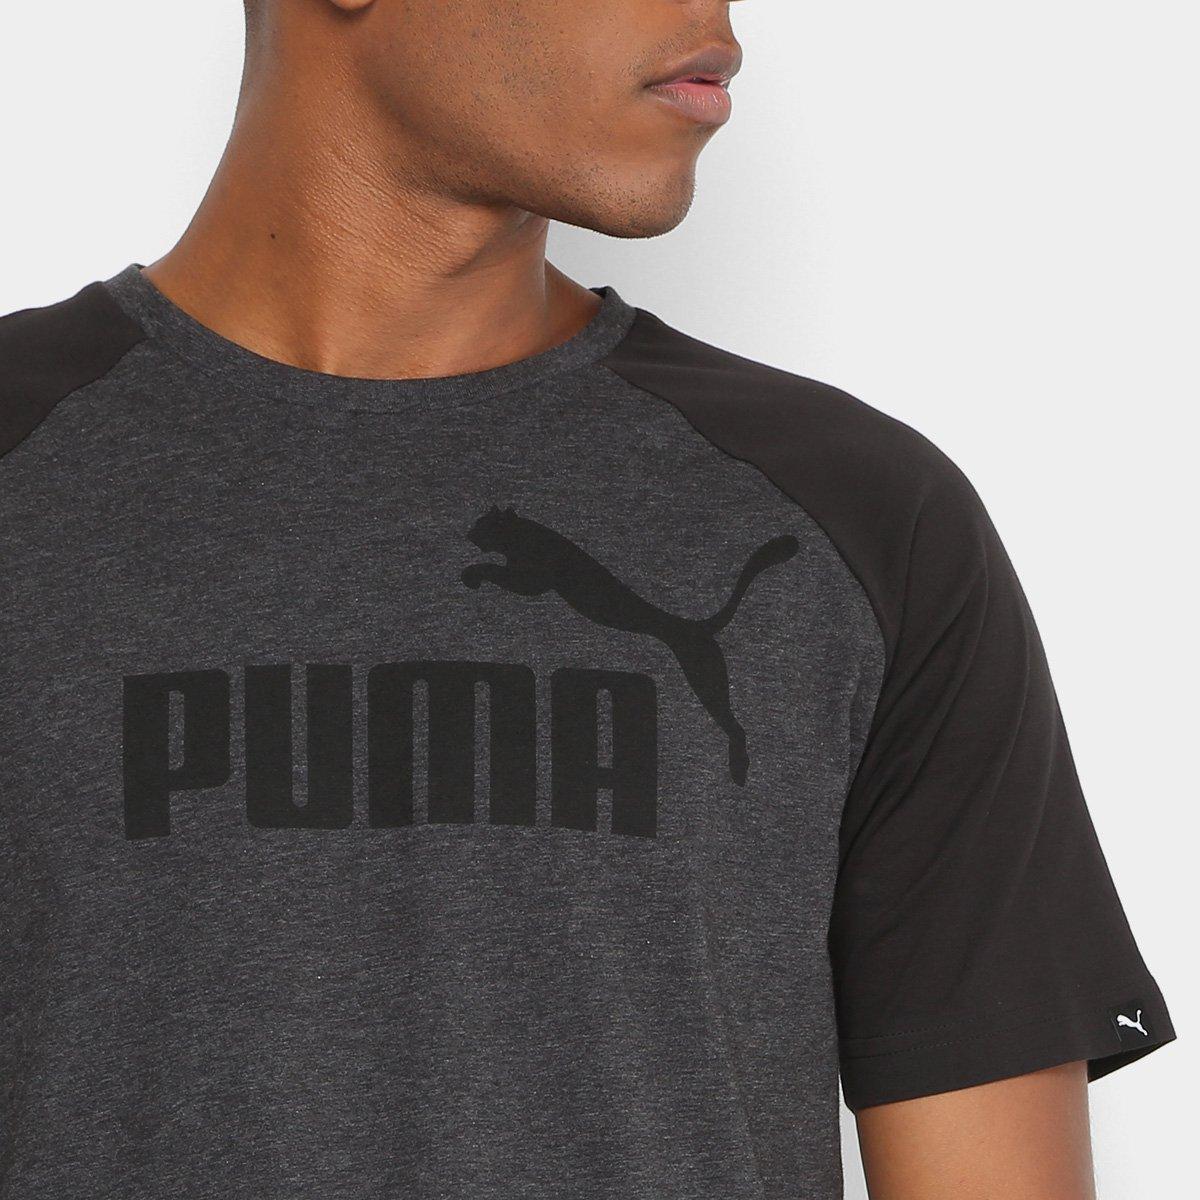 5b33967d1d Camiseta Puma No.1 Logo Raglan Masculina - Compre Agora